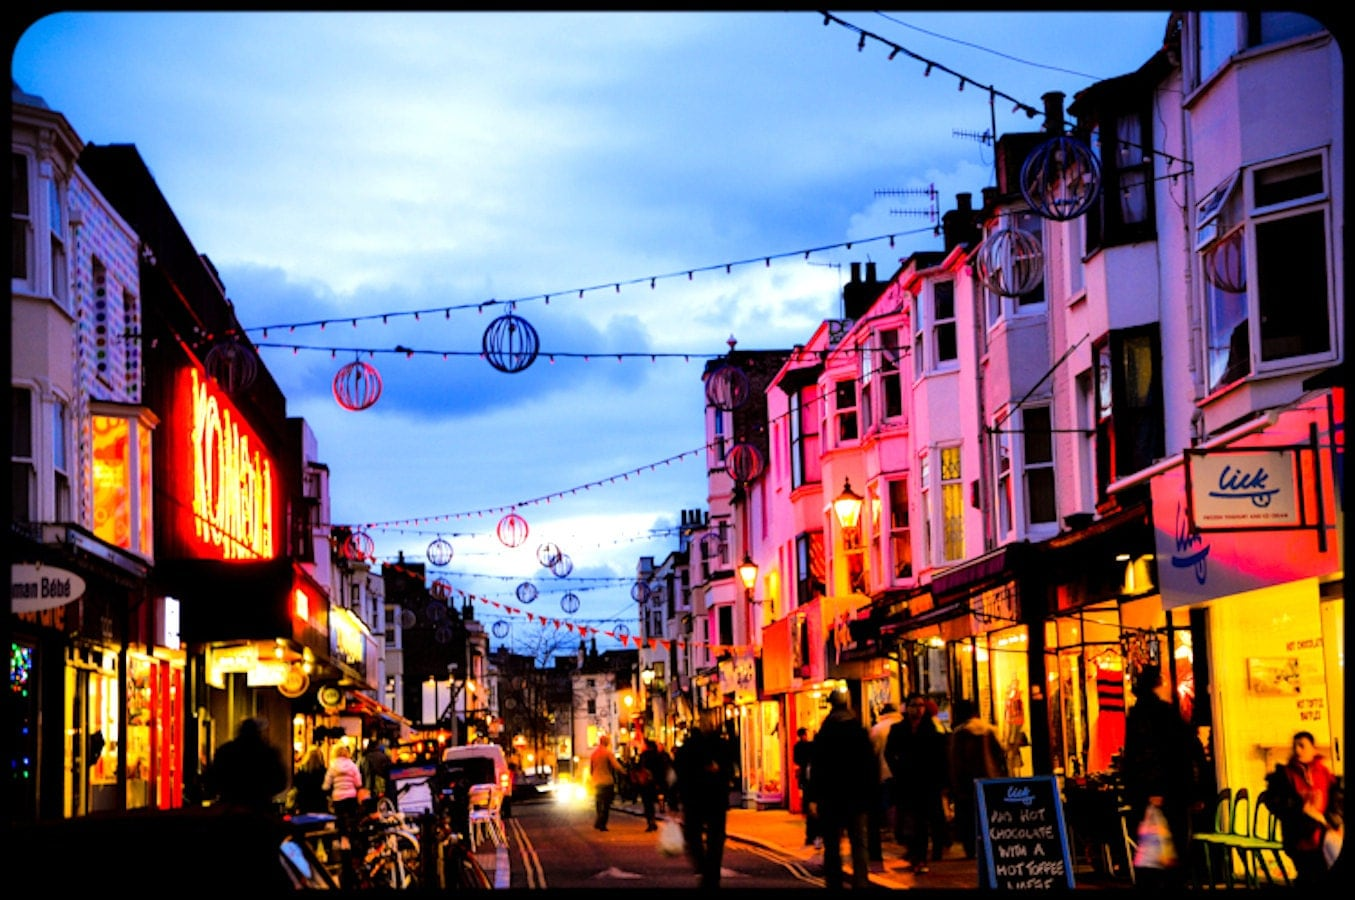 Brighton england street night street photo brighton england for The brighton